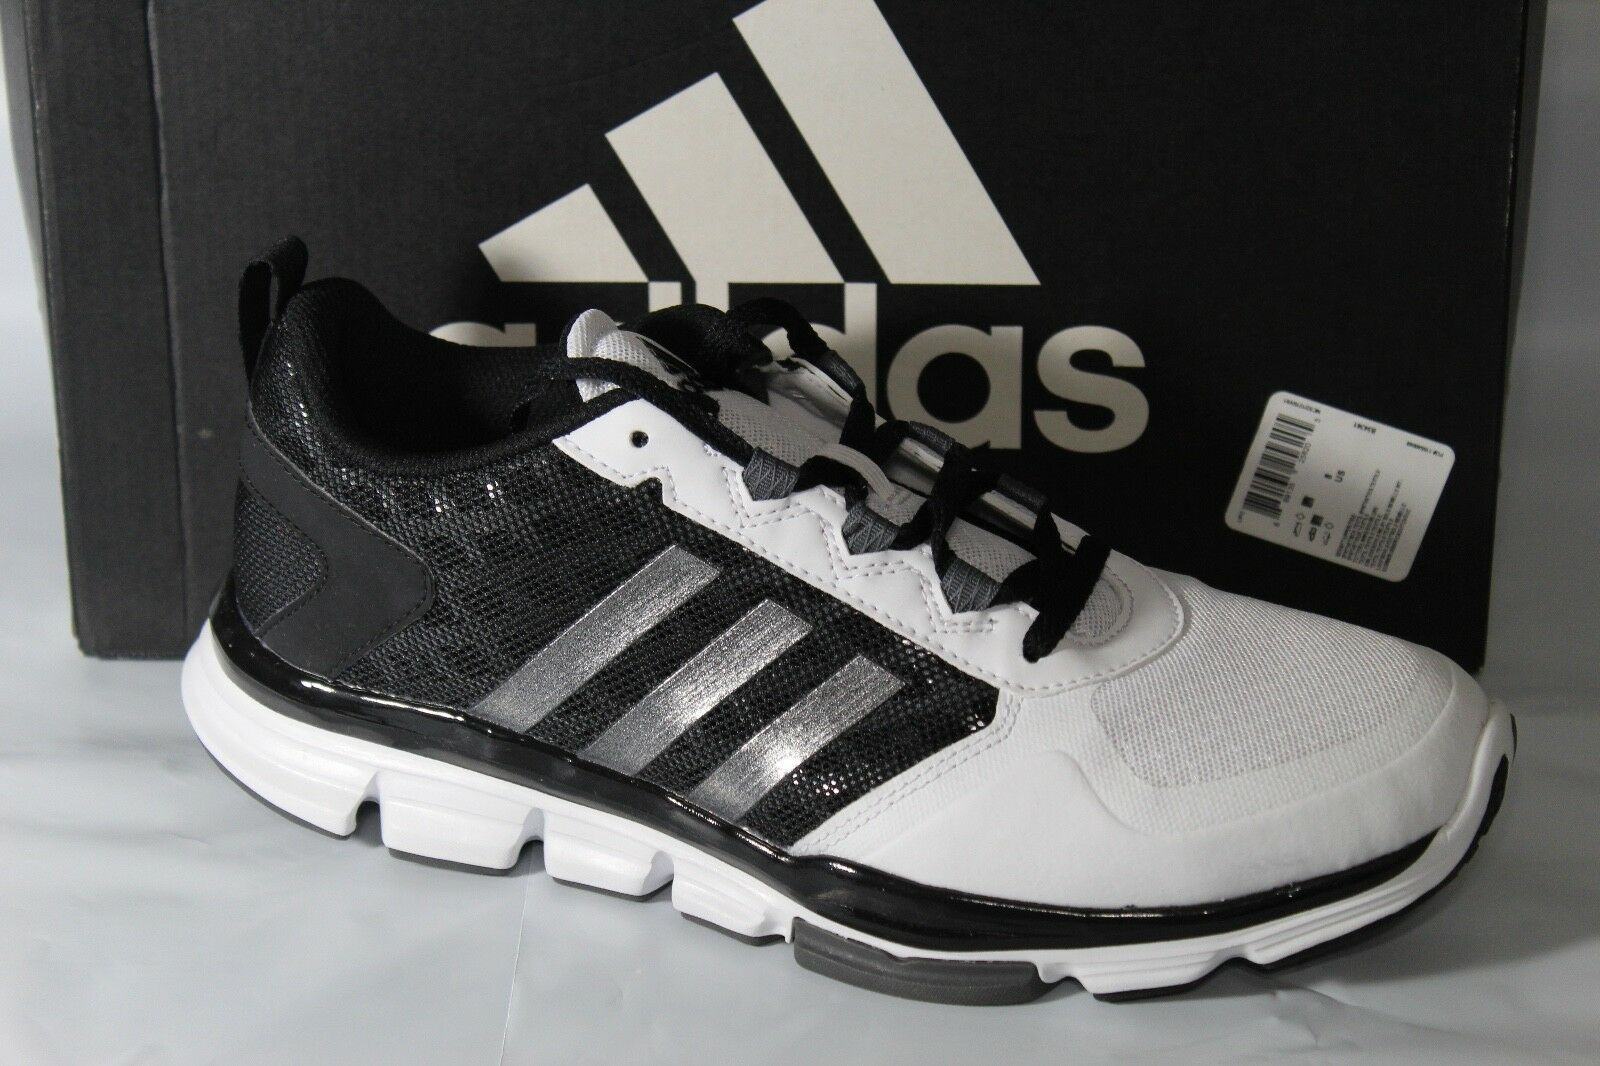 Adidas 2 velocit trainer 2 Adidas scarpe da uomo, volume 8, nero / bianco / argento, b54341 88254b